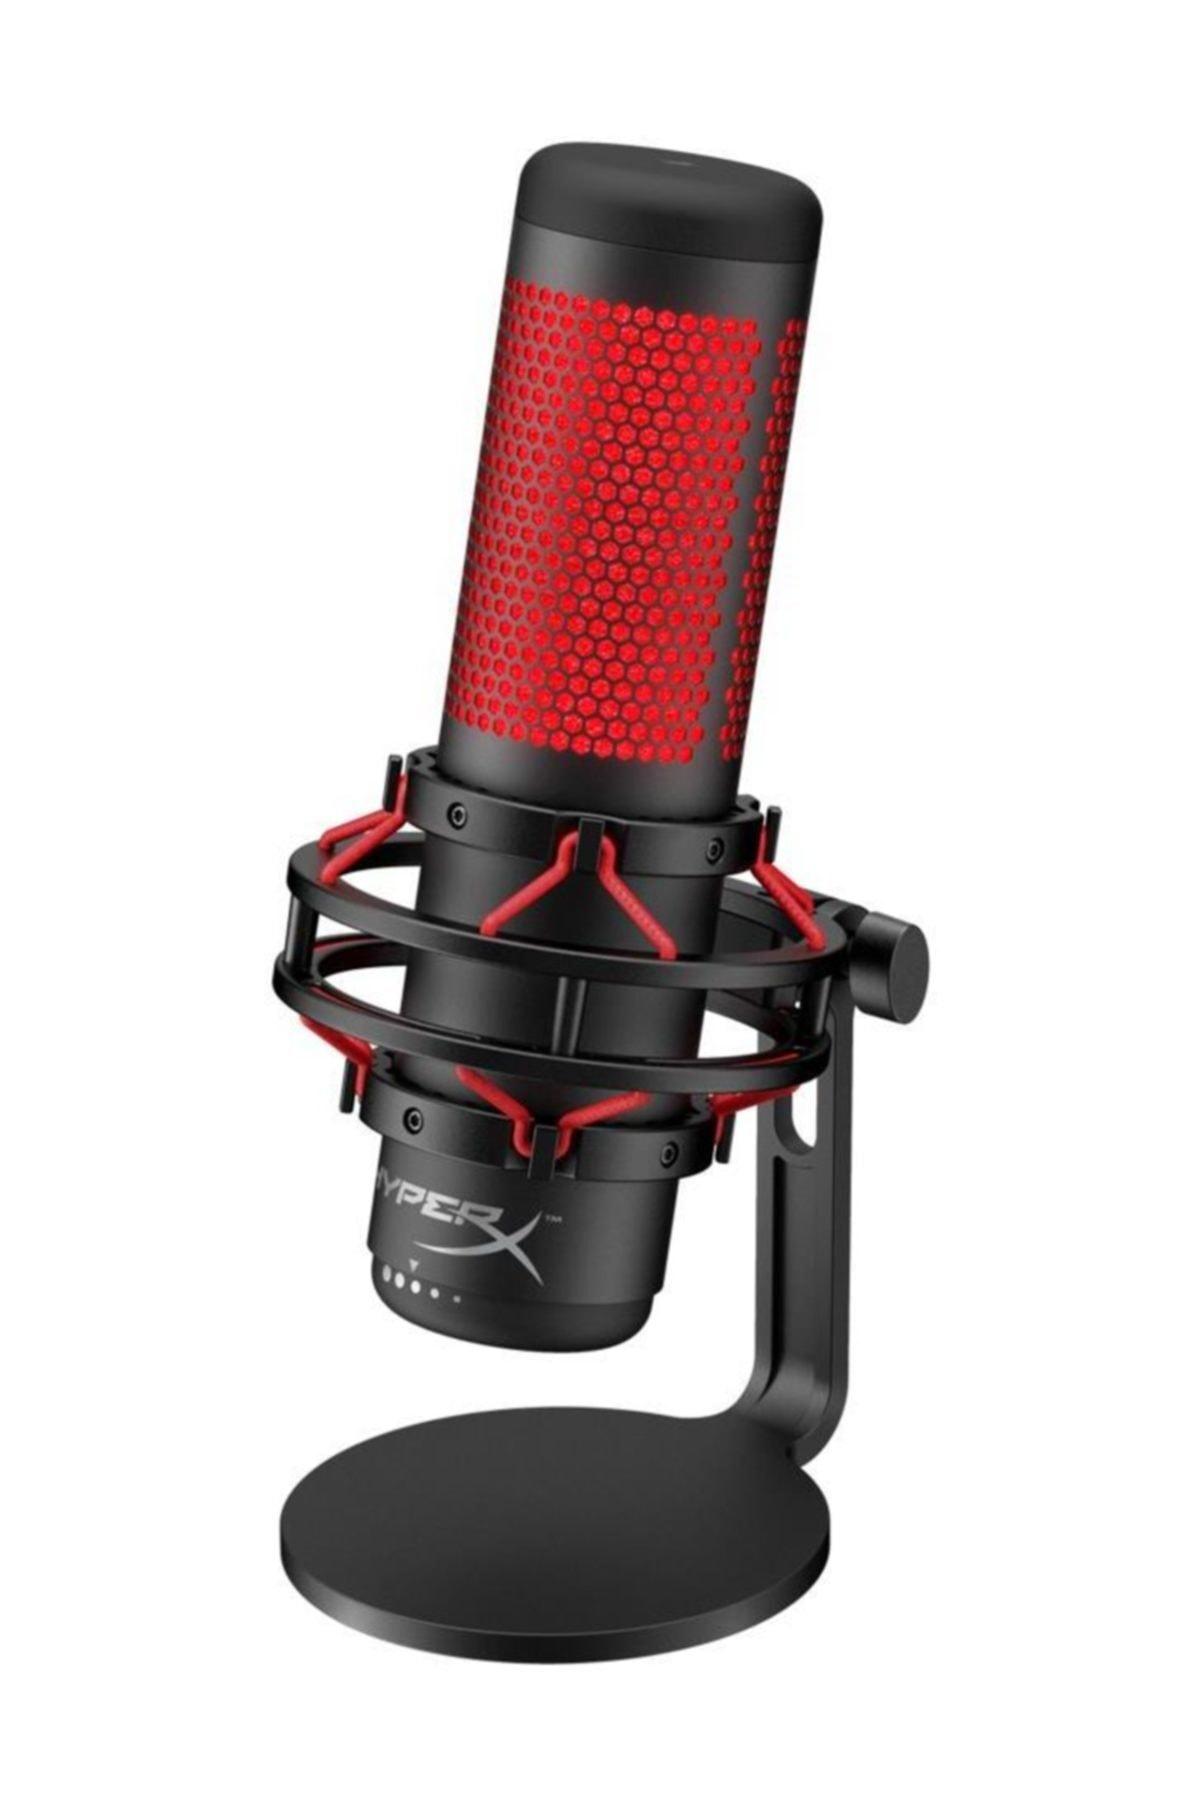 HyperX Quadcast Oyuncu Mikrofonu - Kırmızı 1